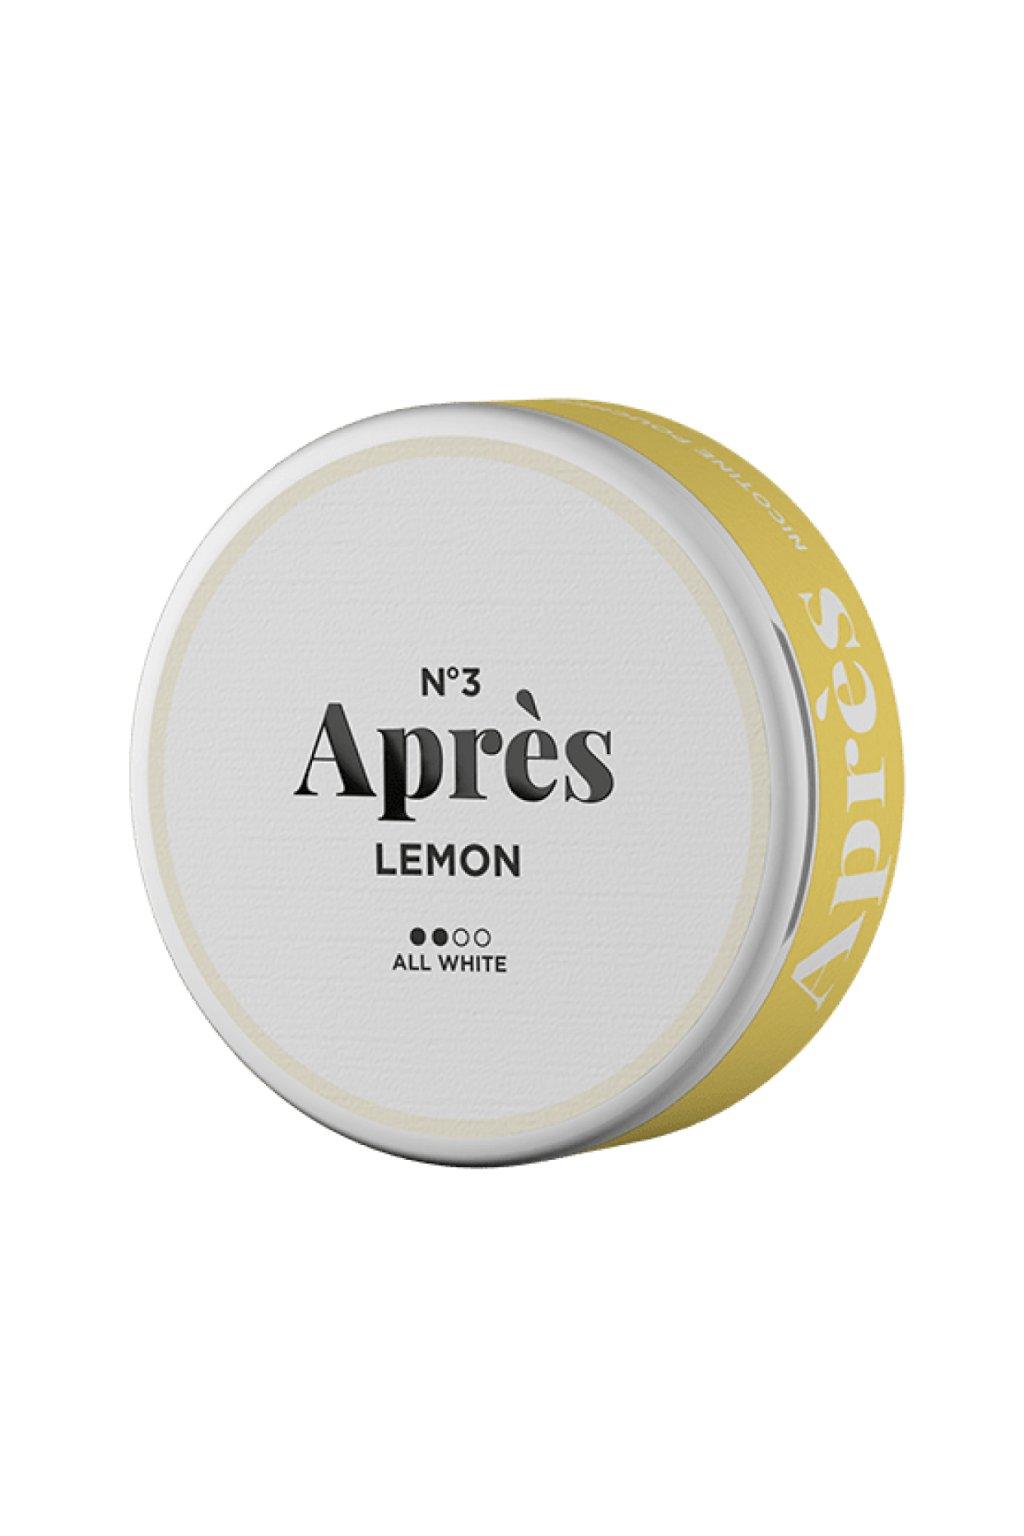 apres lemon nikotinove sacky nicopods min